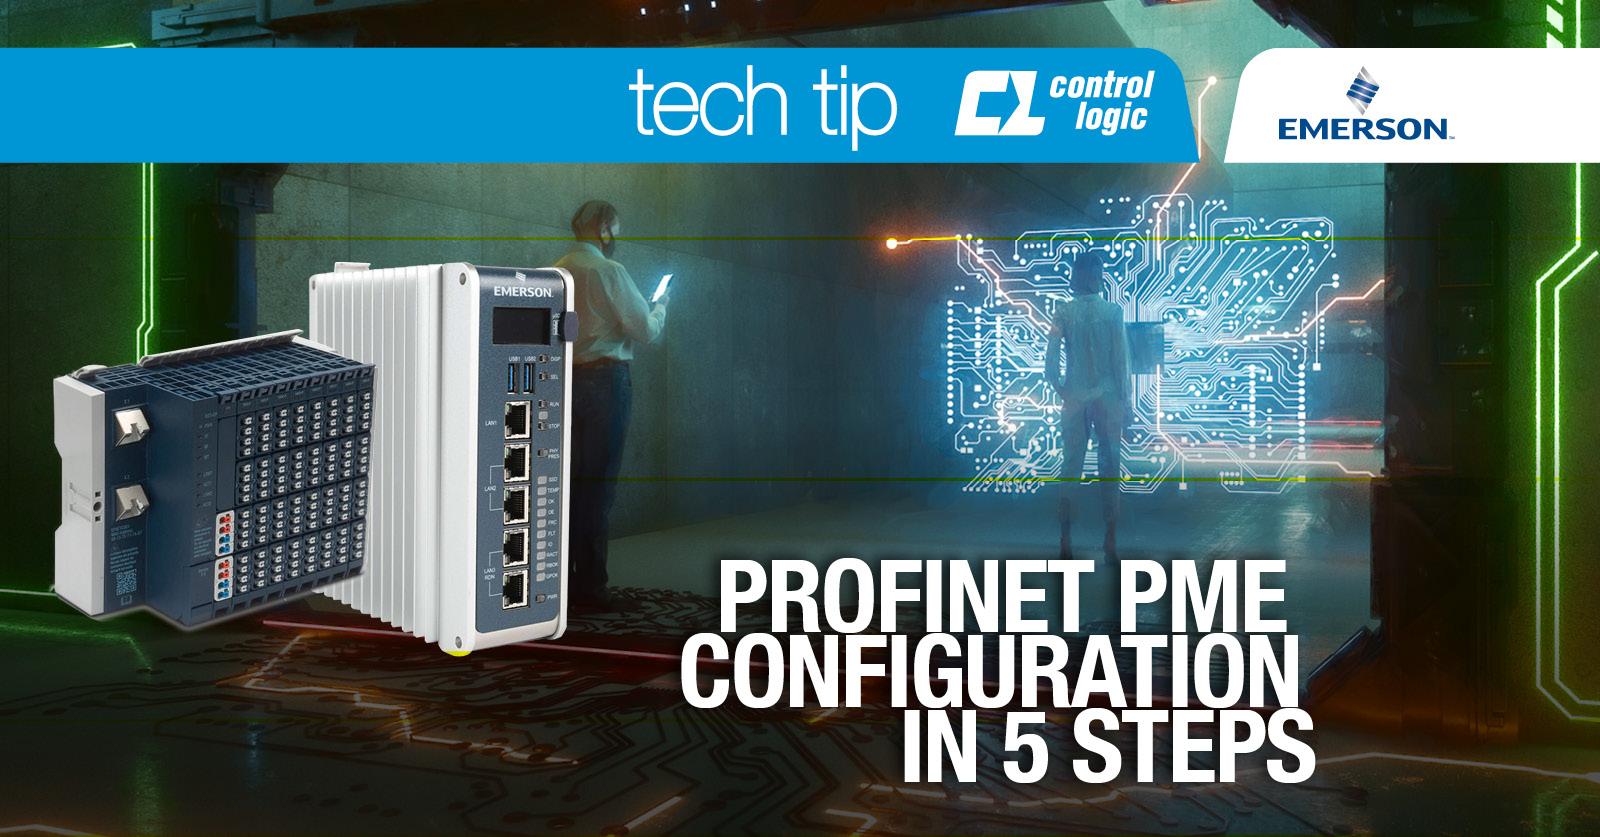 PROFINET PME configuration in 5 steps